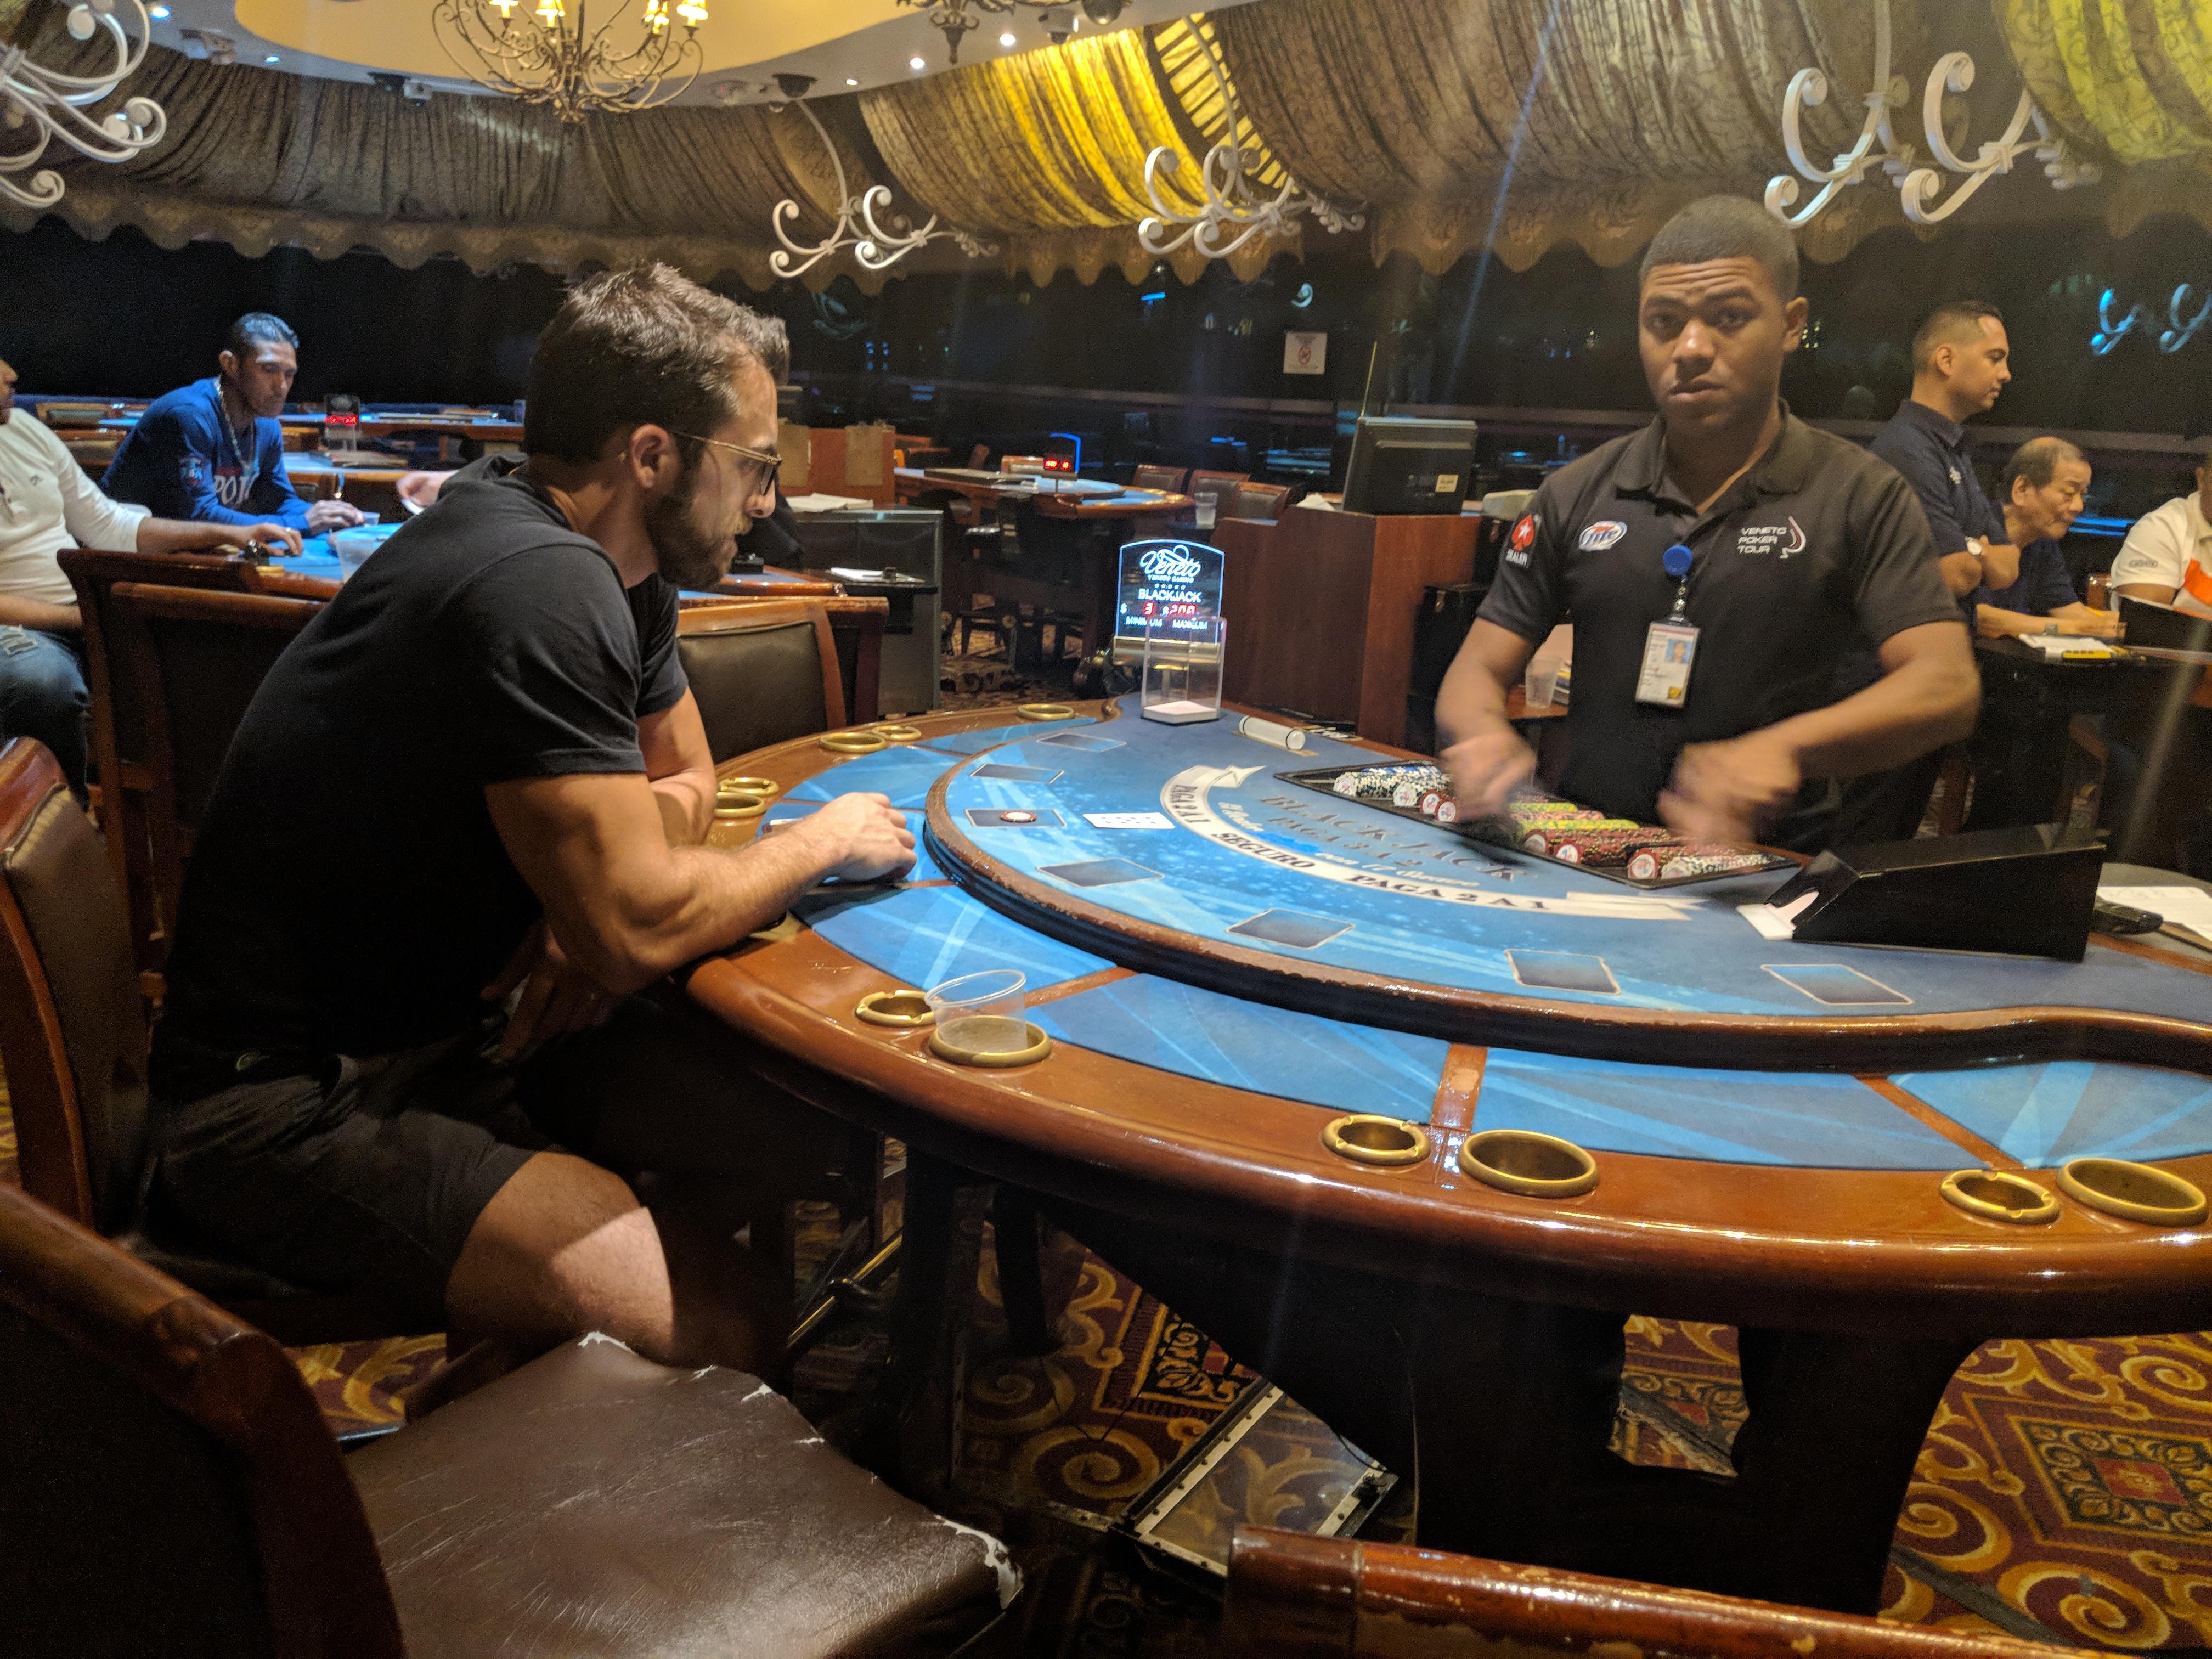 panama city blackjack player